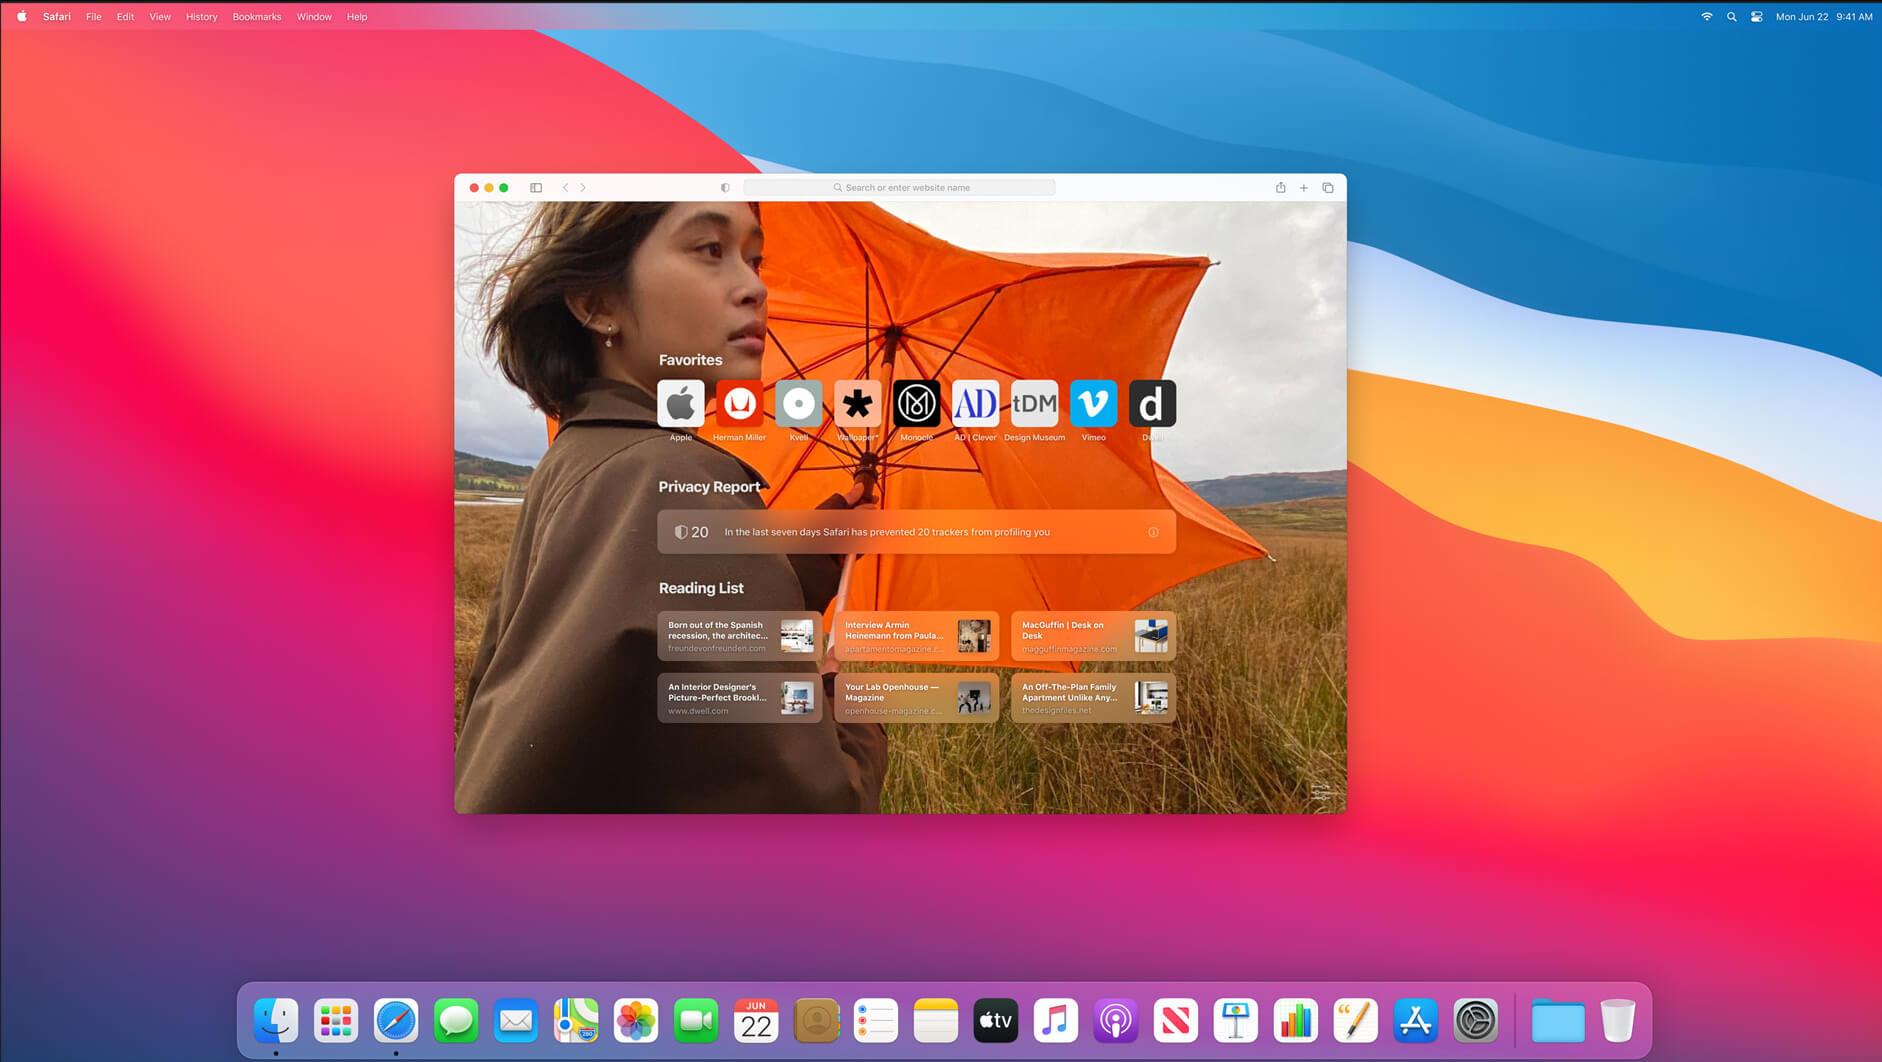 macOS-Big-Sur-11.2-Torrent-Free-Download